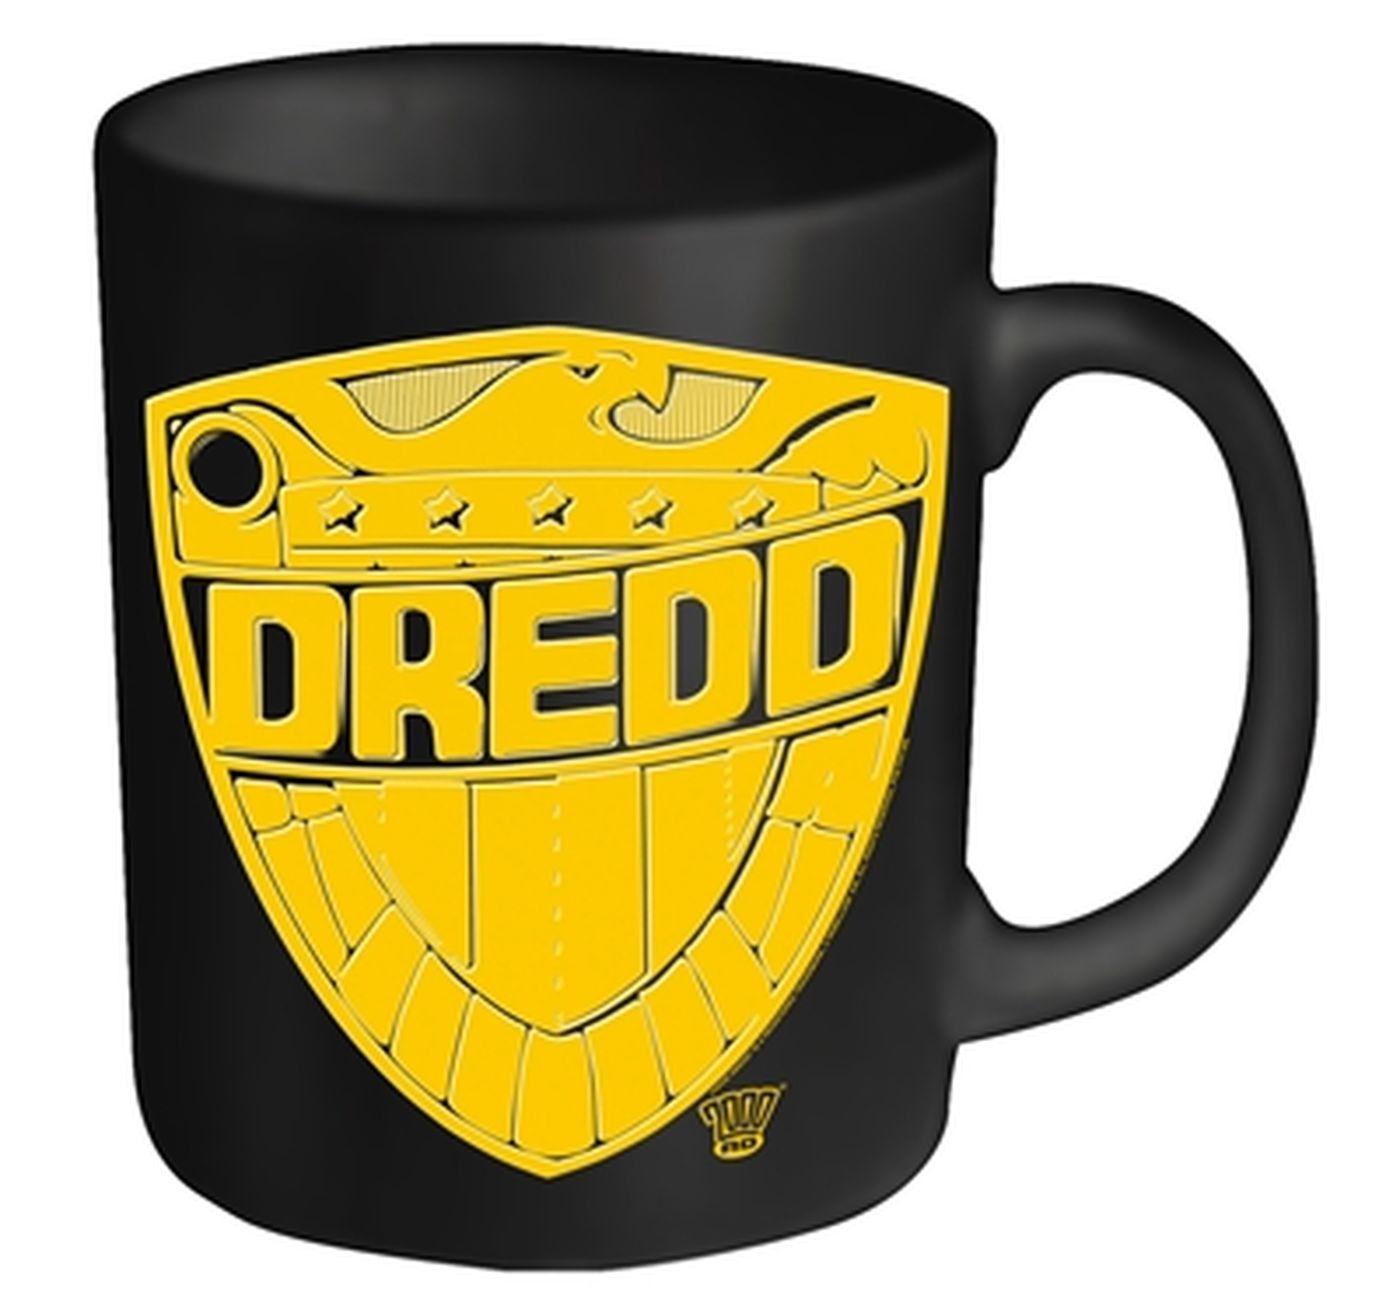 2000AD Judge Dredd Badge mug - Official - Something Geeky